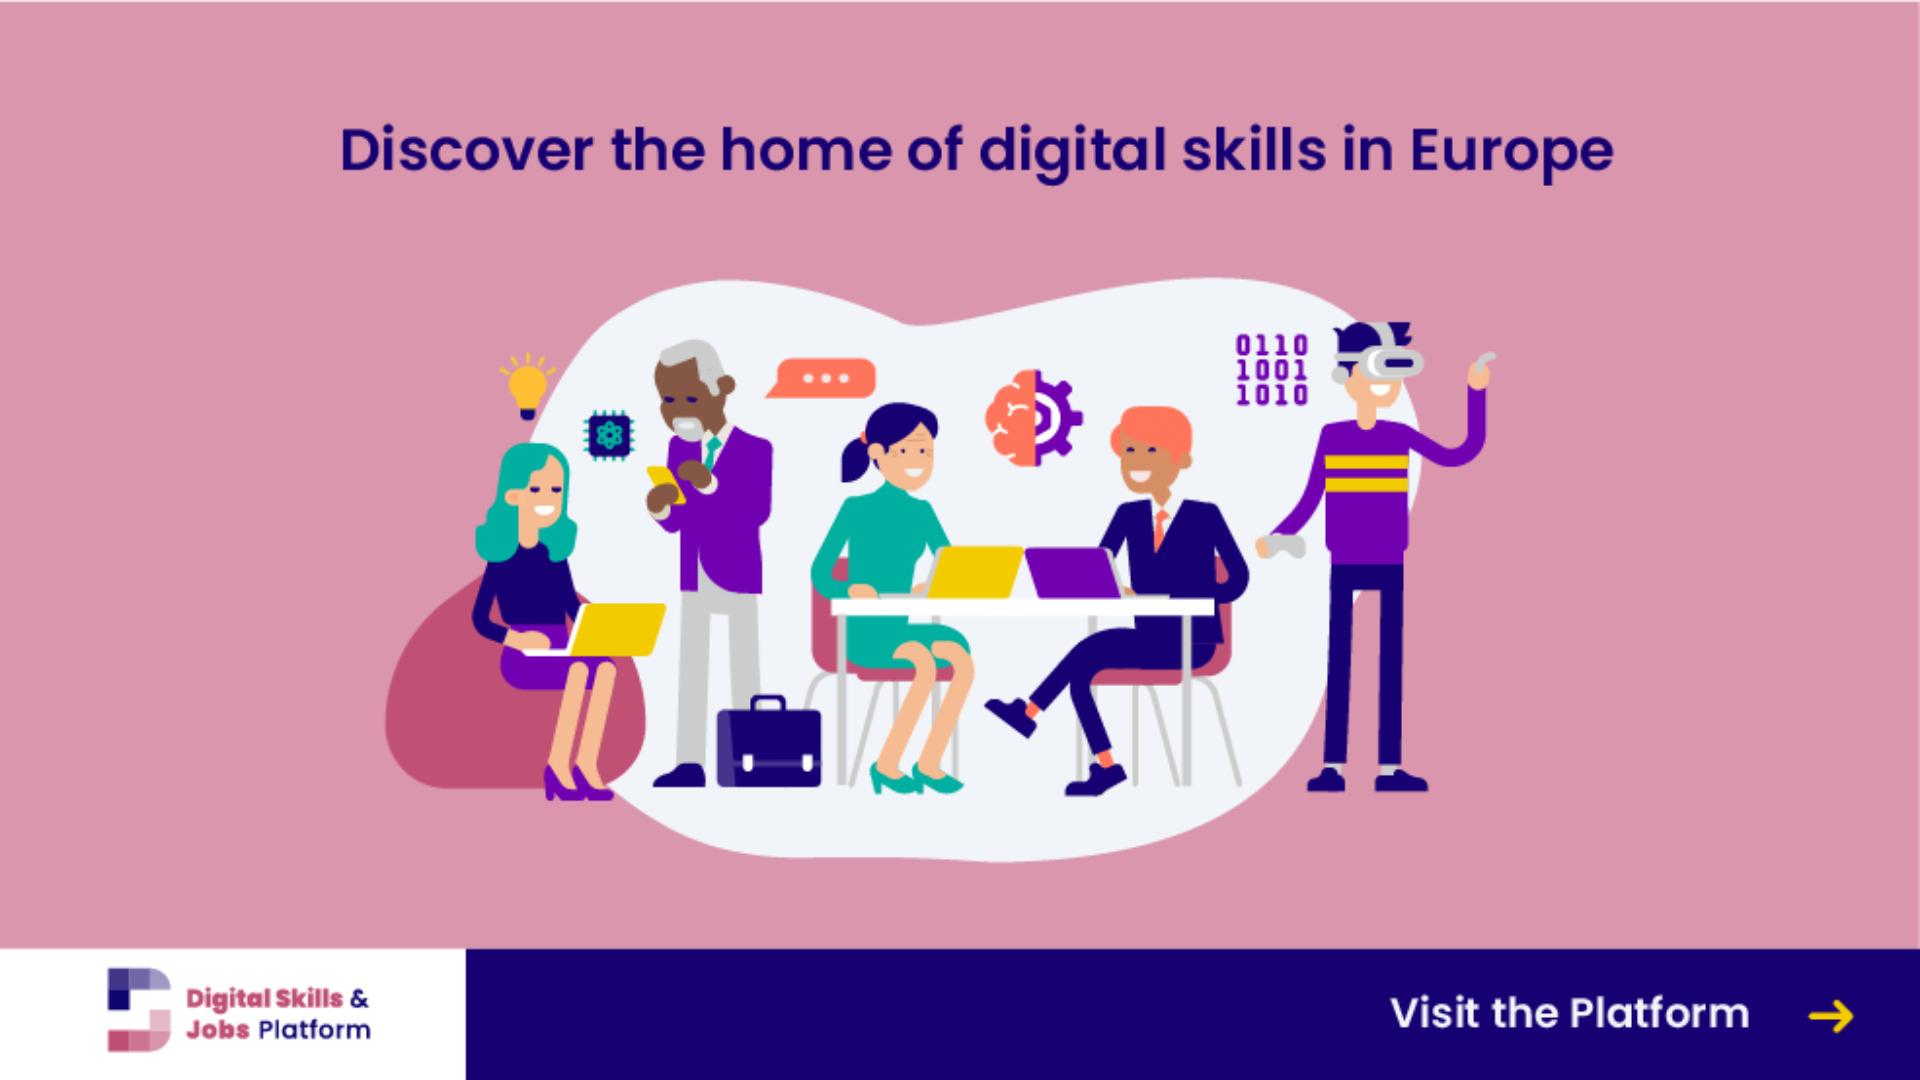 Digital Skills & Jobs Platform – the new home of digital skills in Europe